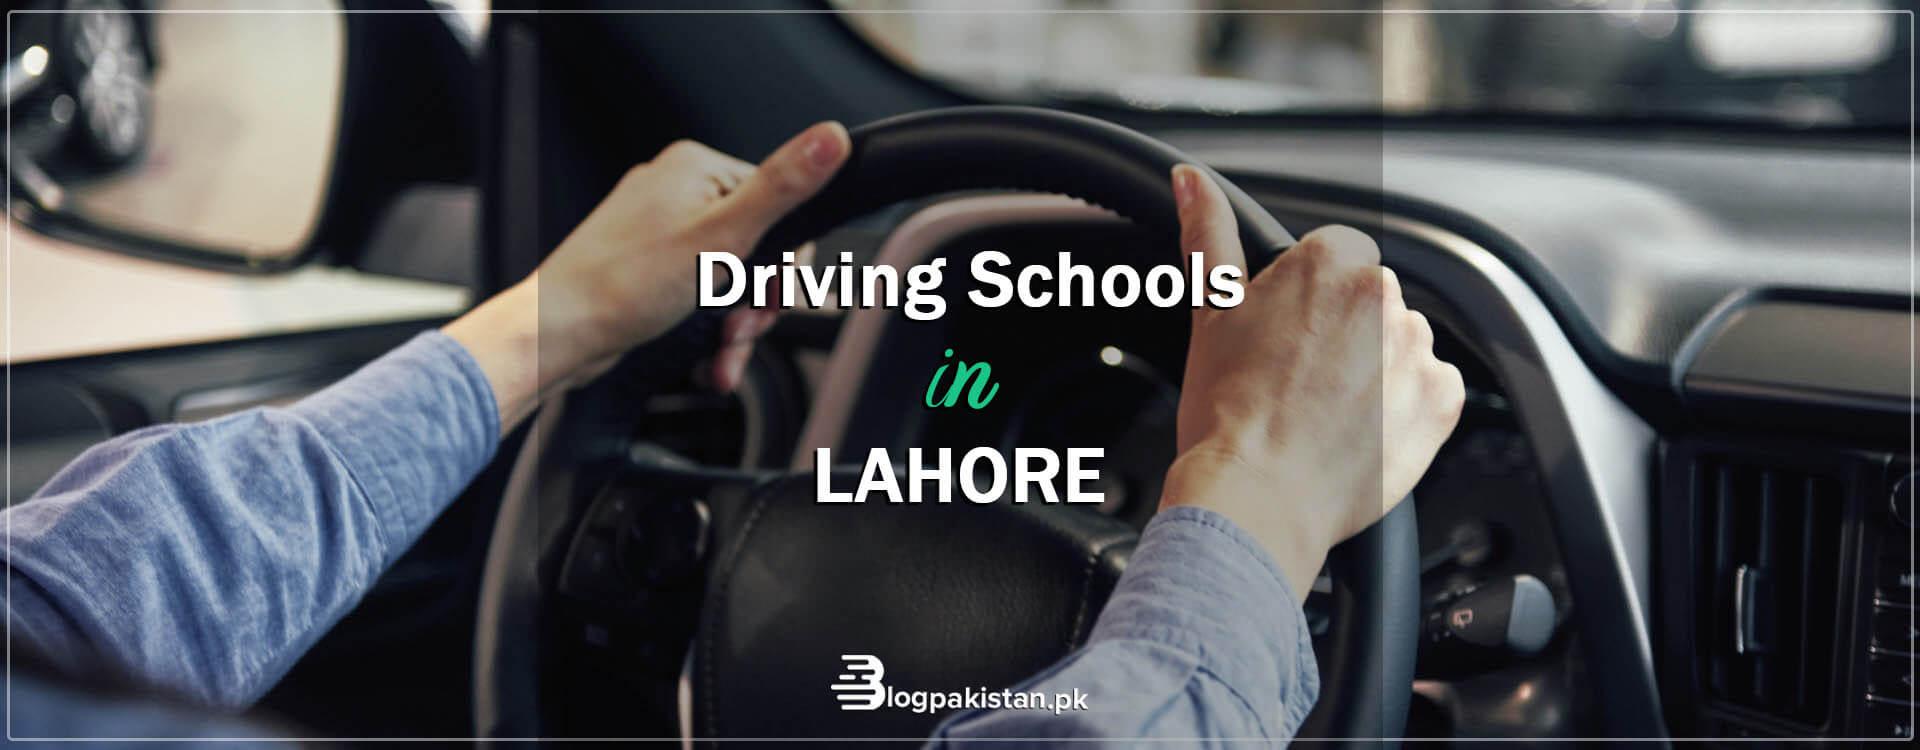 Driving schools in Lahore